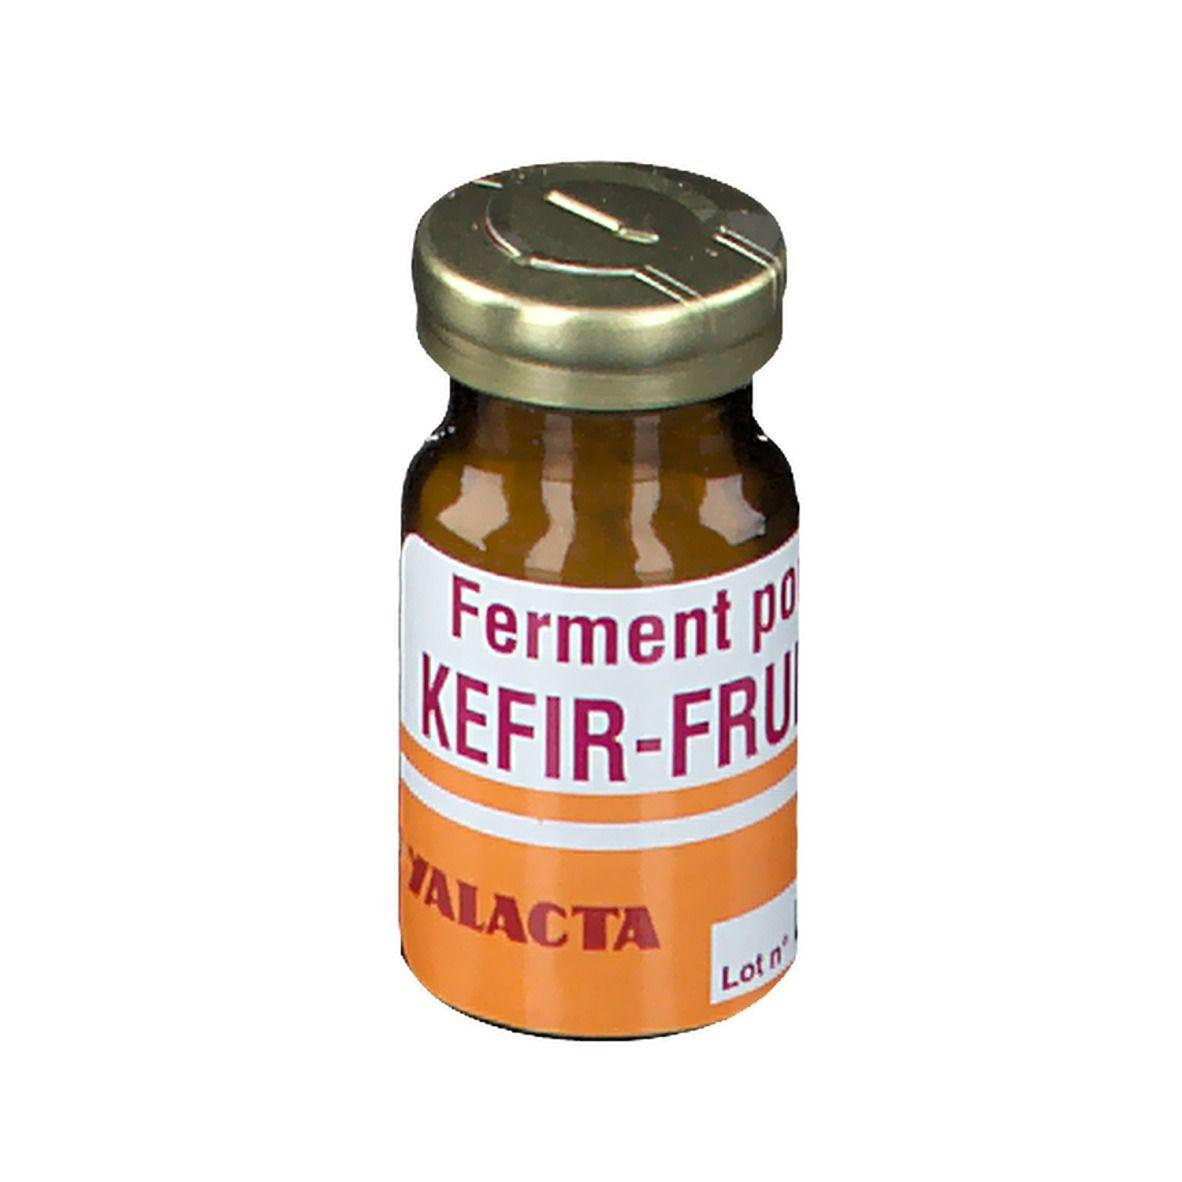 Yalacta Kefir Fruit g poudre